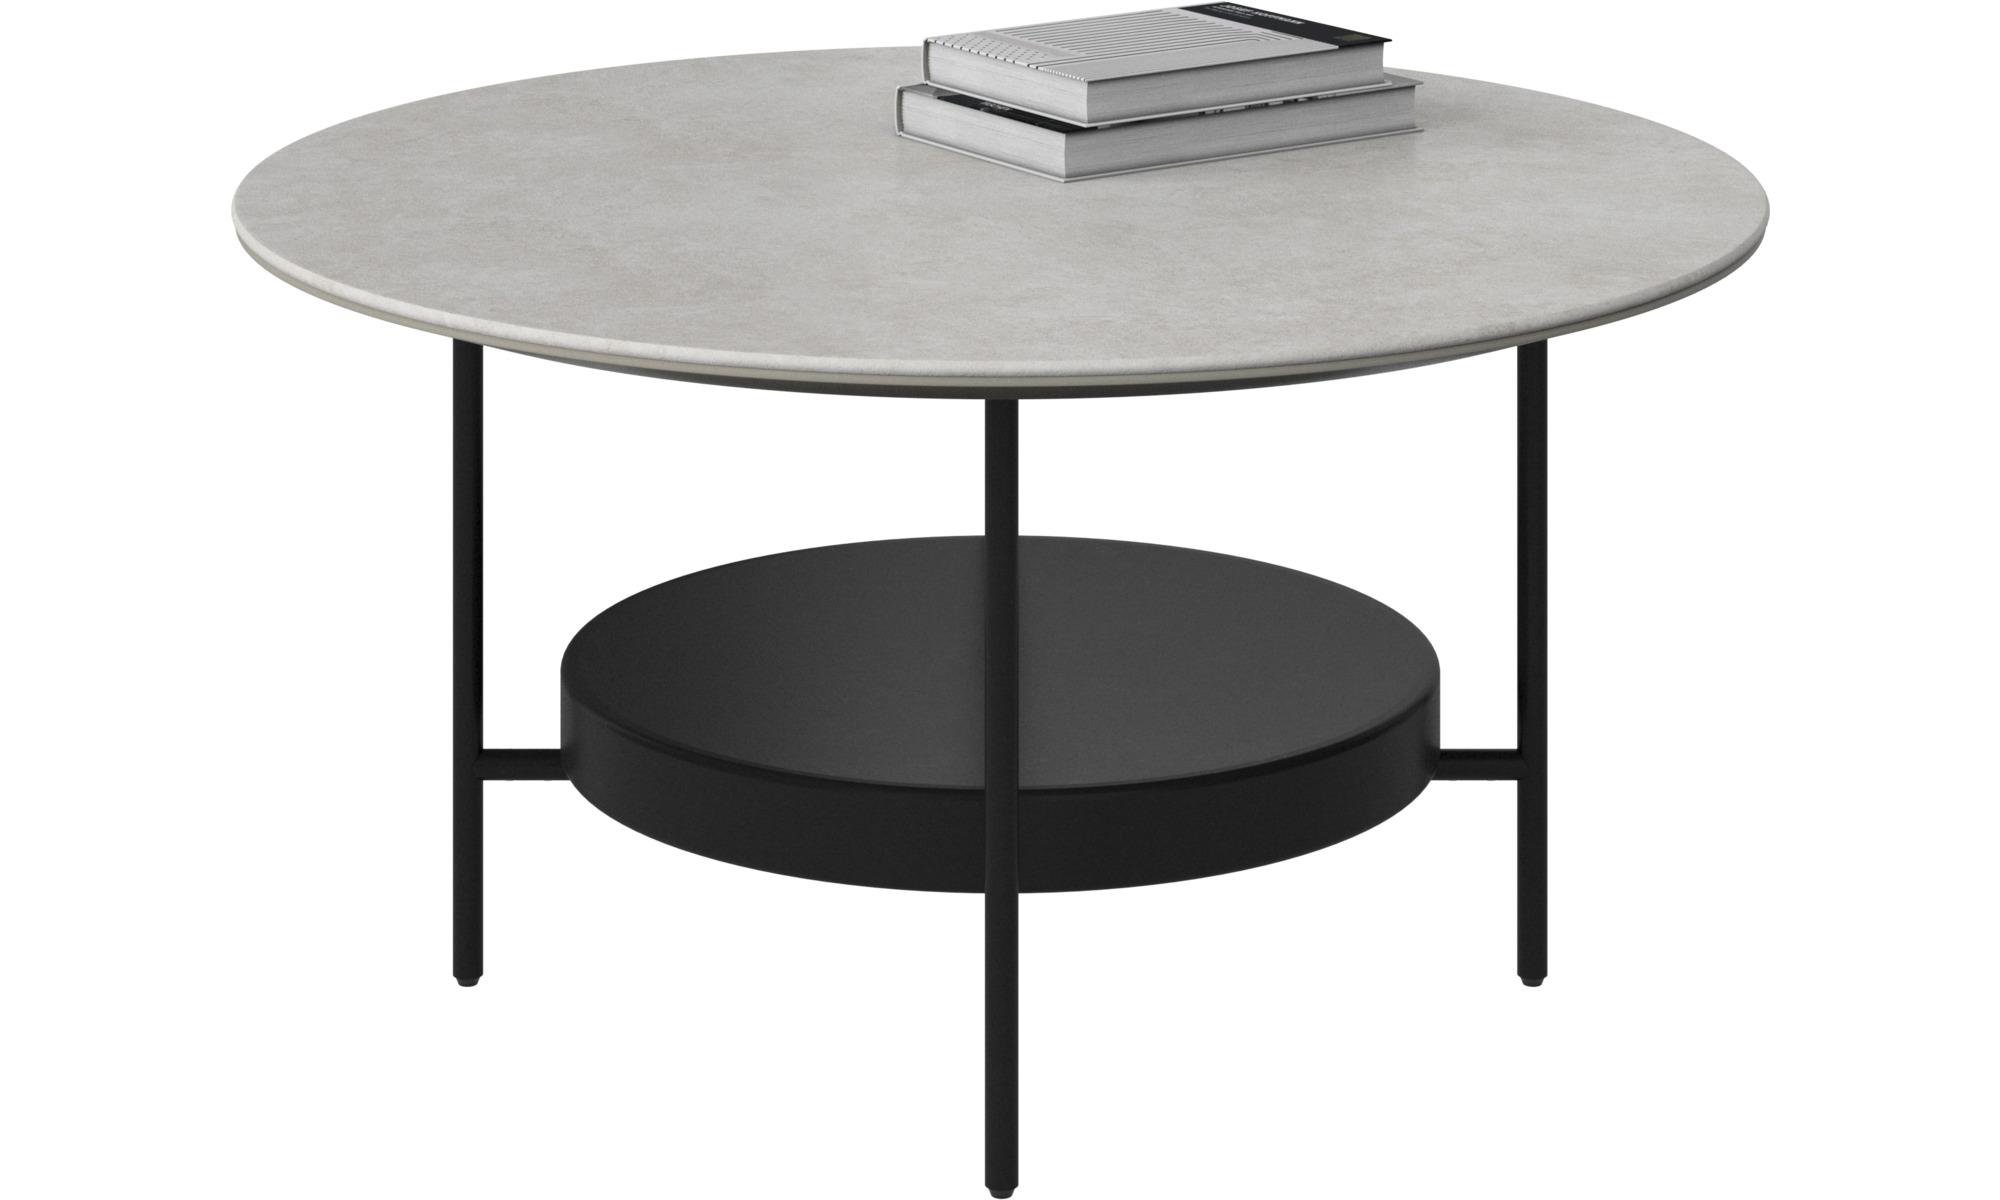 Coffee Tables Madrid Table Round Gray Ceramic